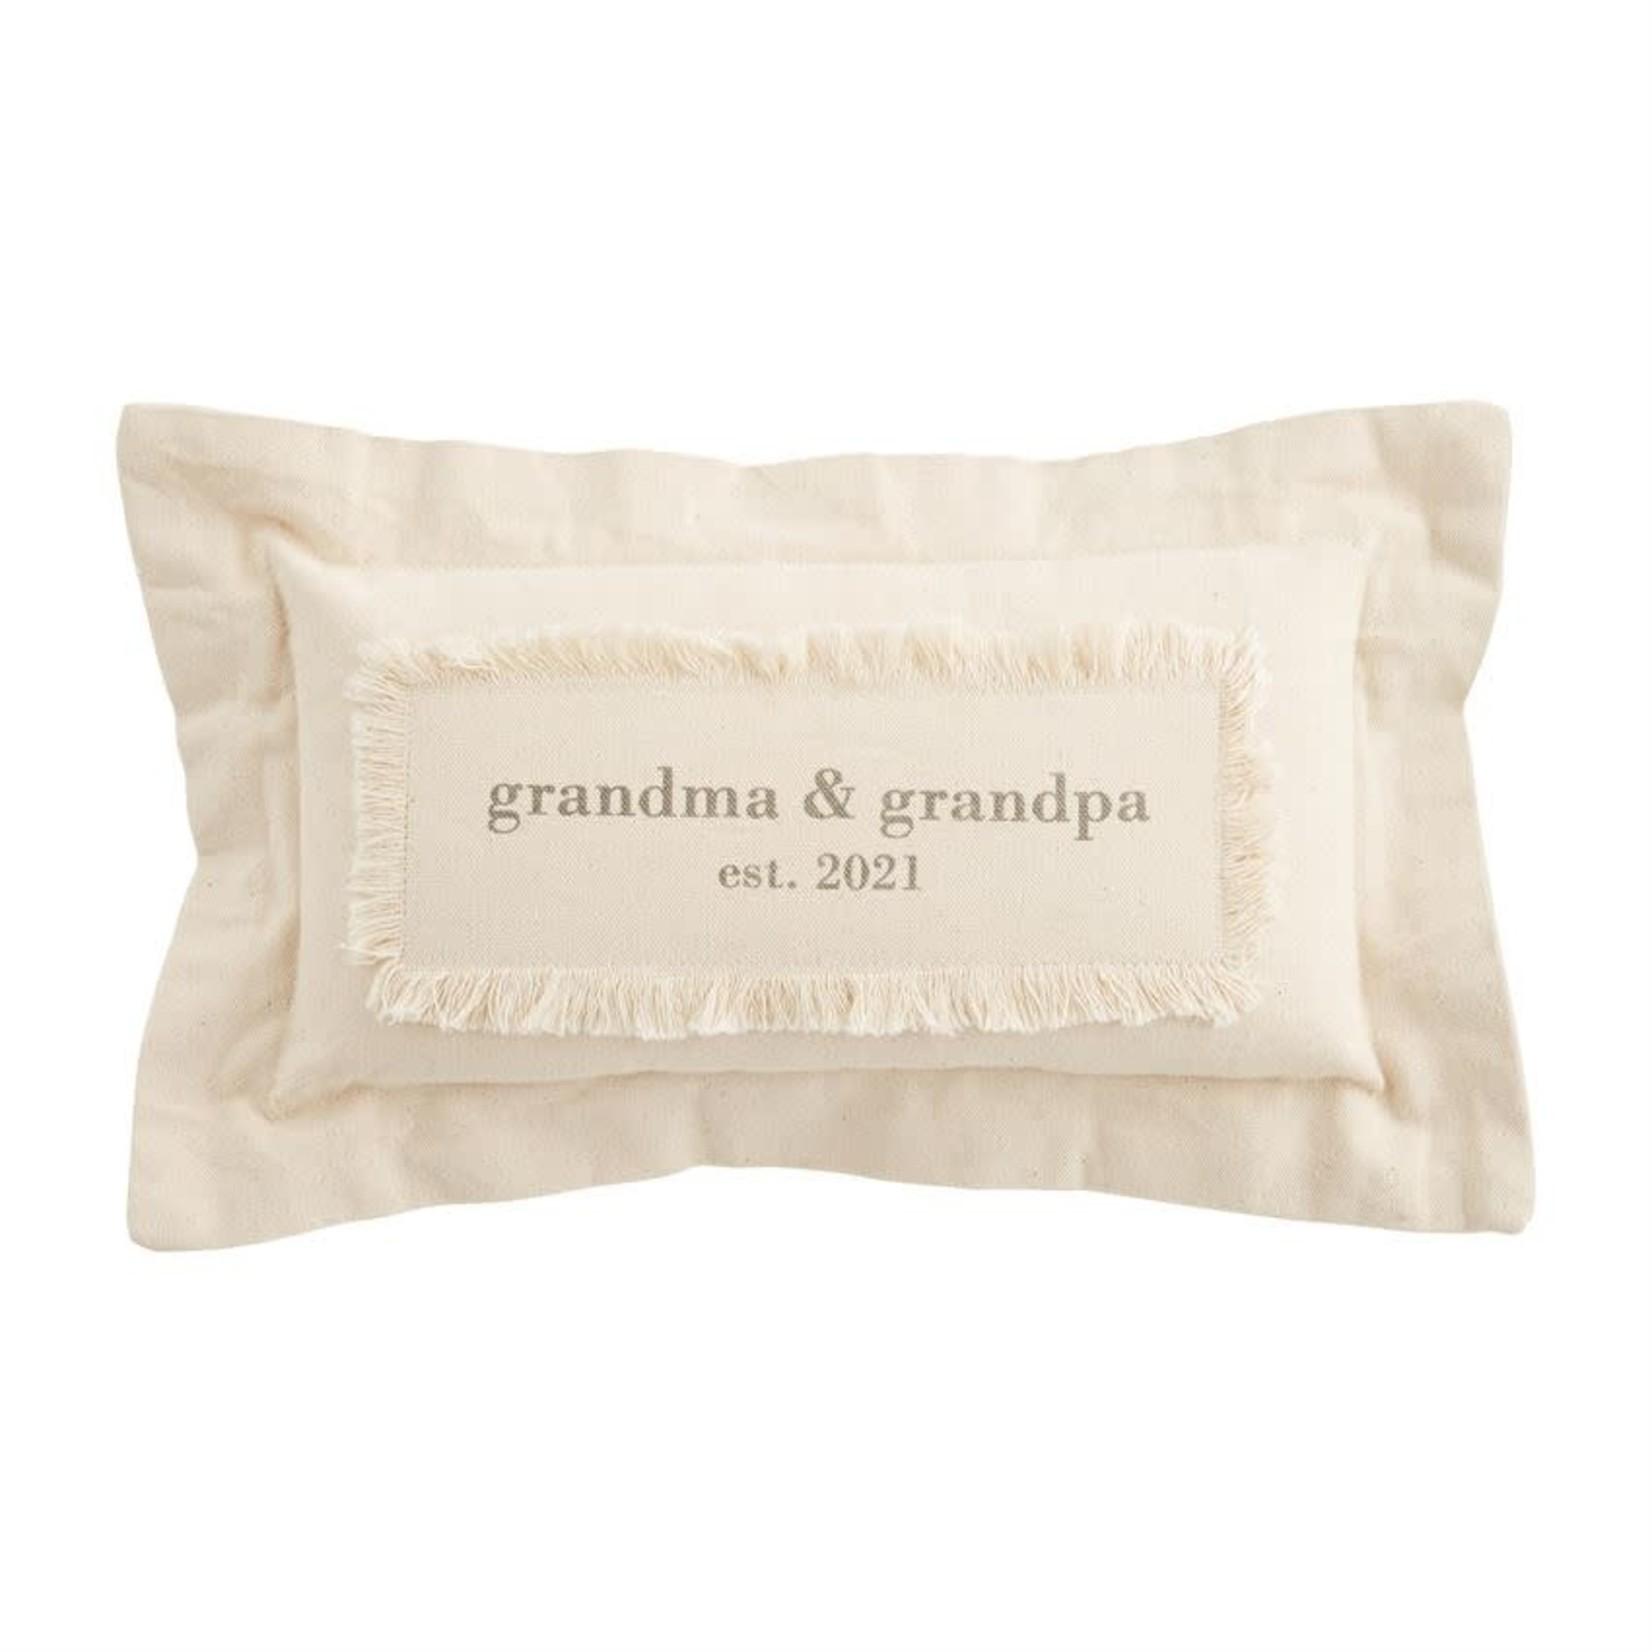 Grandma Grandpa Est 2021 Pillow